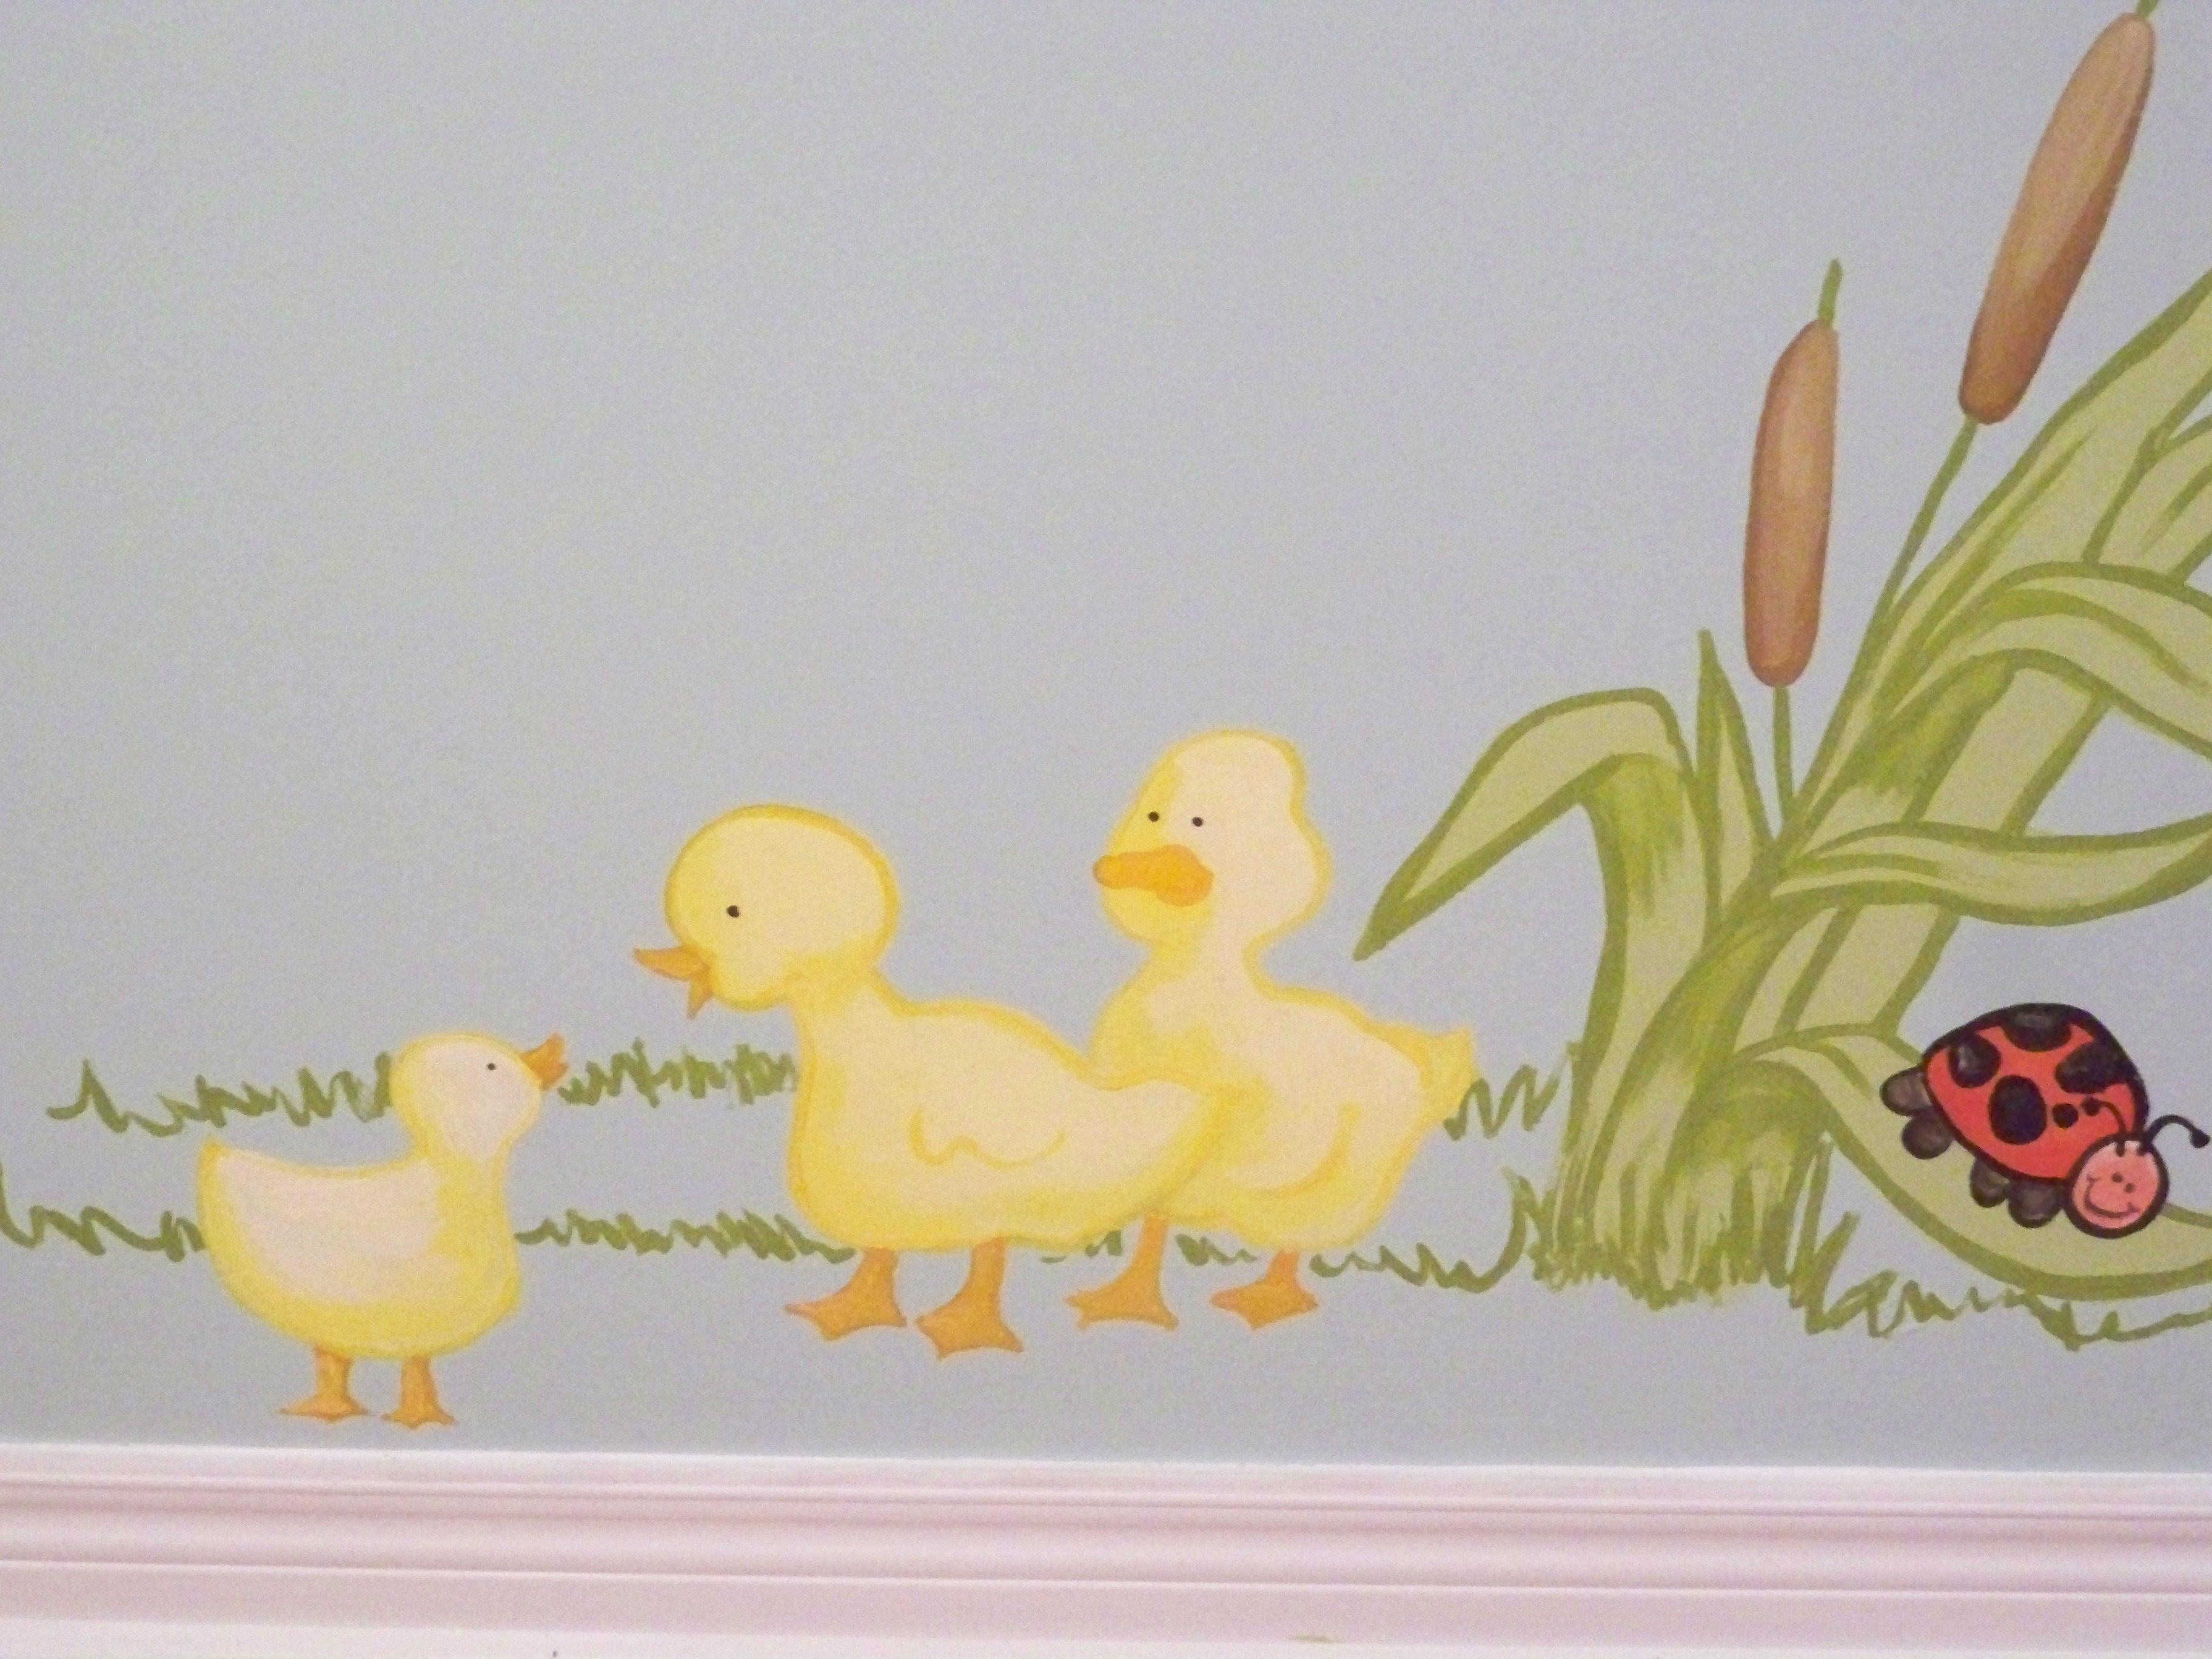 Murals By Marg Giraffe Nursery Mural 2.jpg